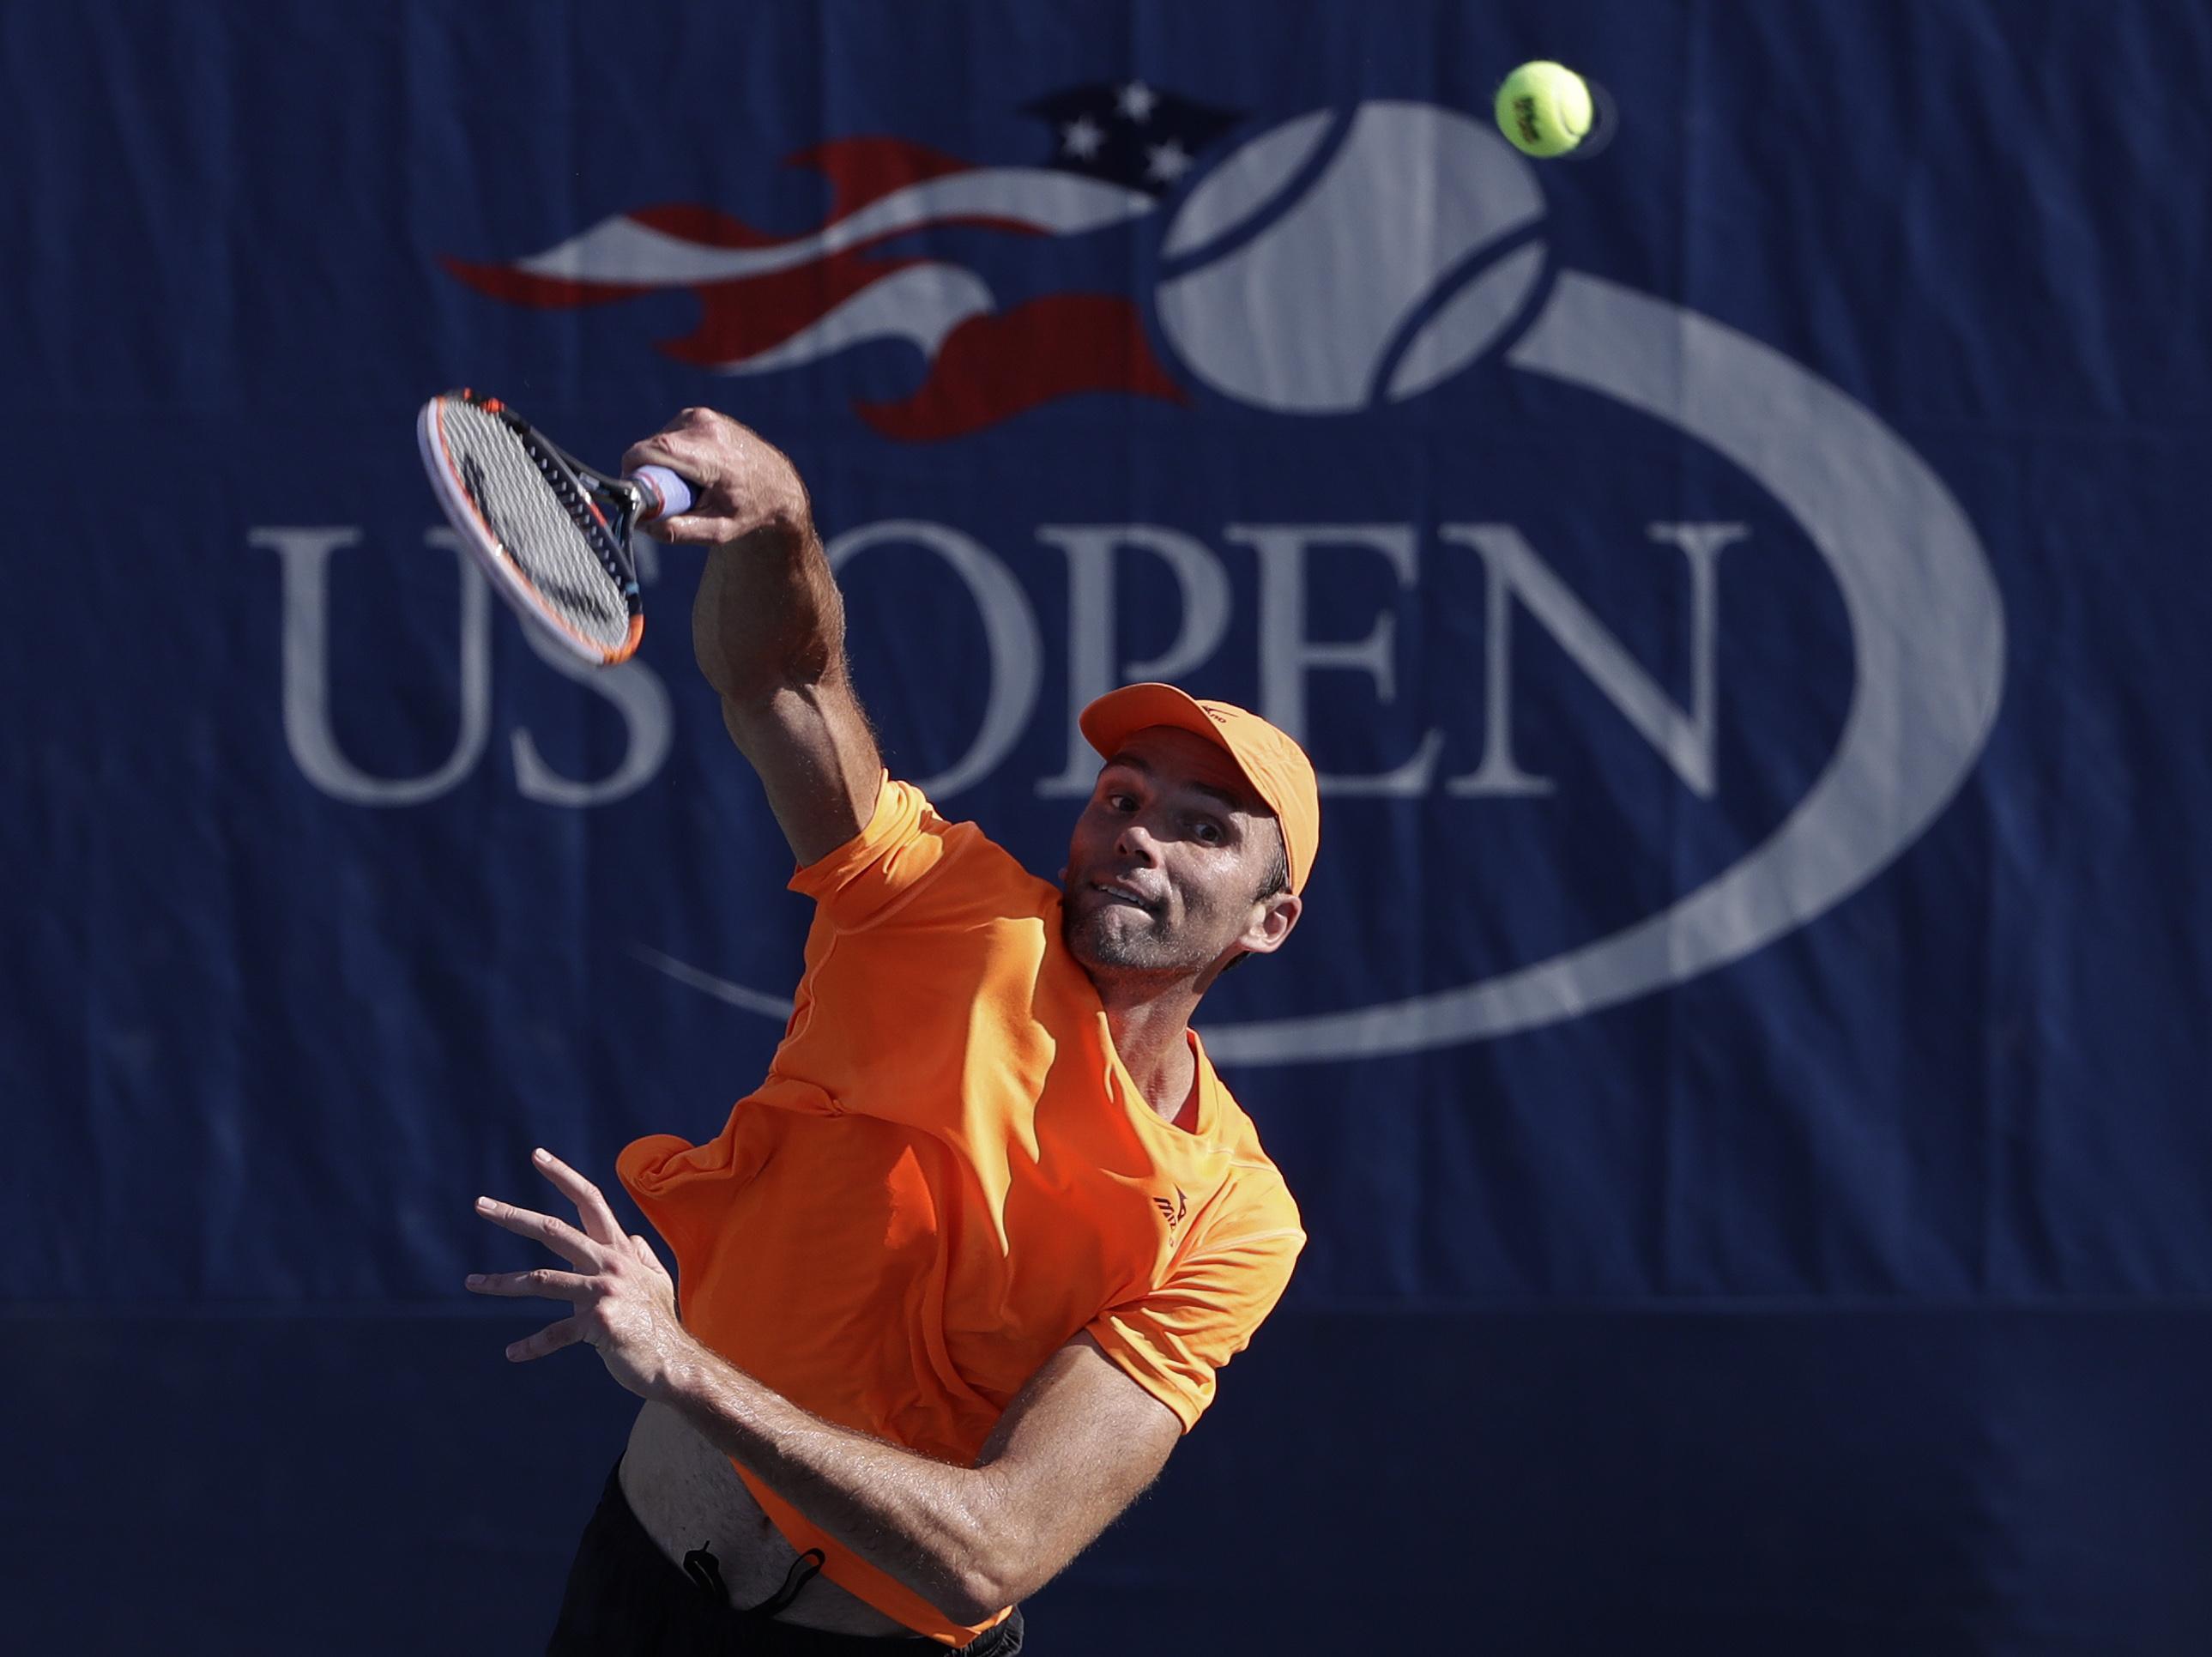 Ivo Karlovic, of Croatia, serves to Yen-Hsun Lu, of Taipei, during the first round of the U.S. Open tennis tournament, Tuesday, Aug. 30, 2016, in New York. (AP Photo/Seth Wenig)